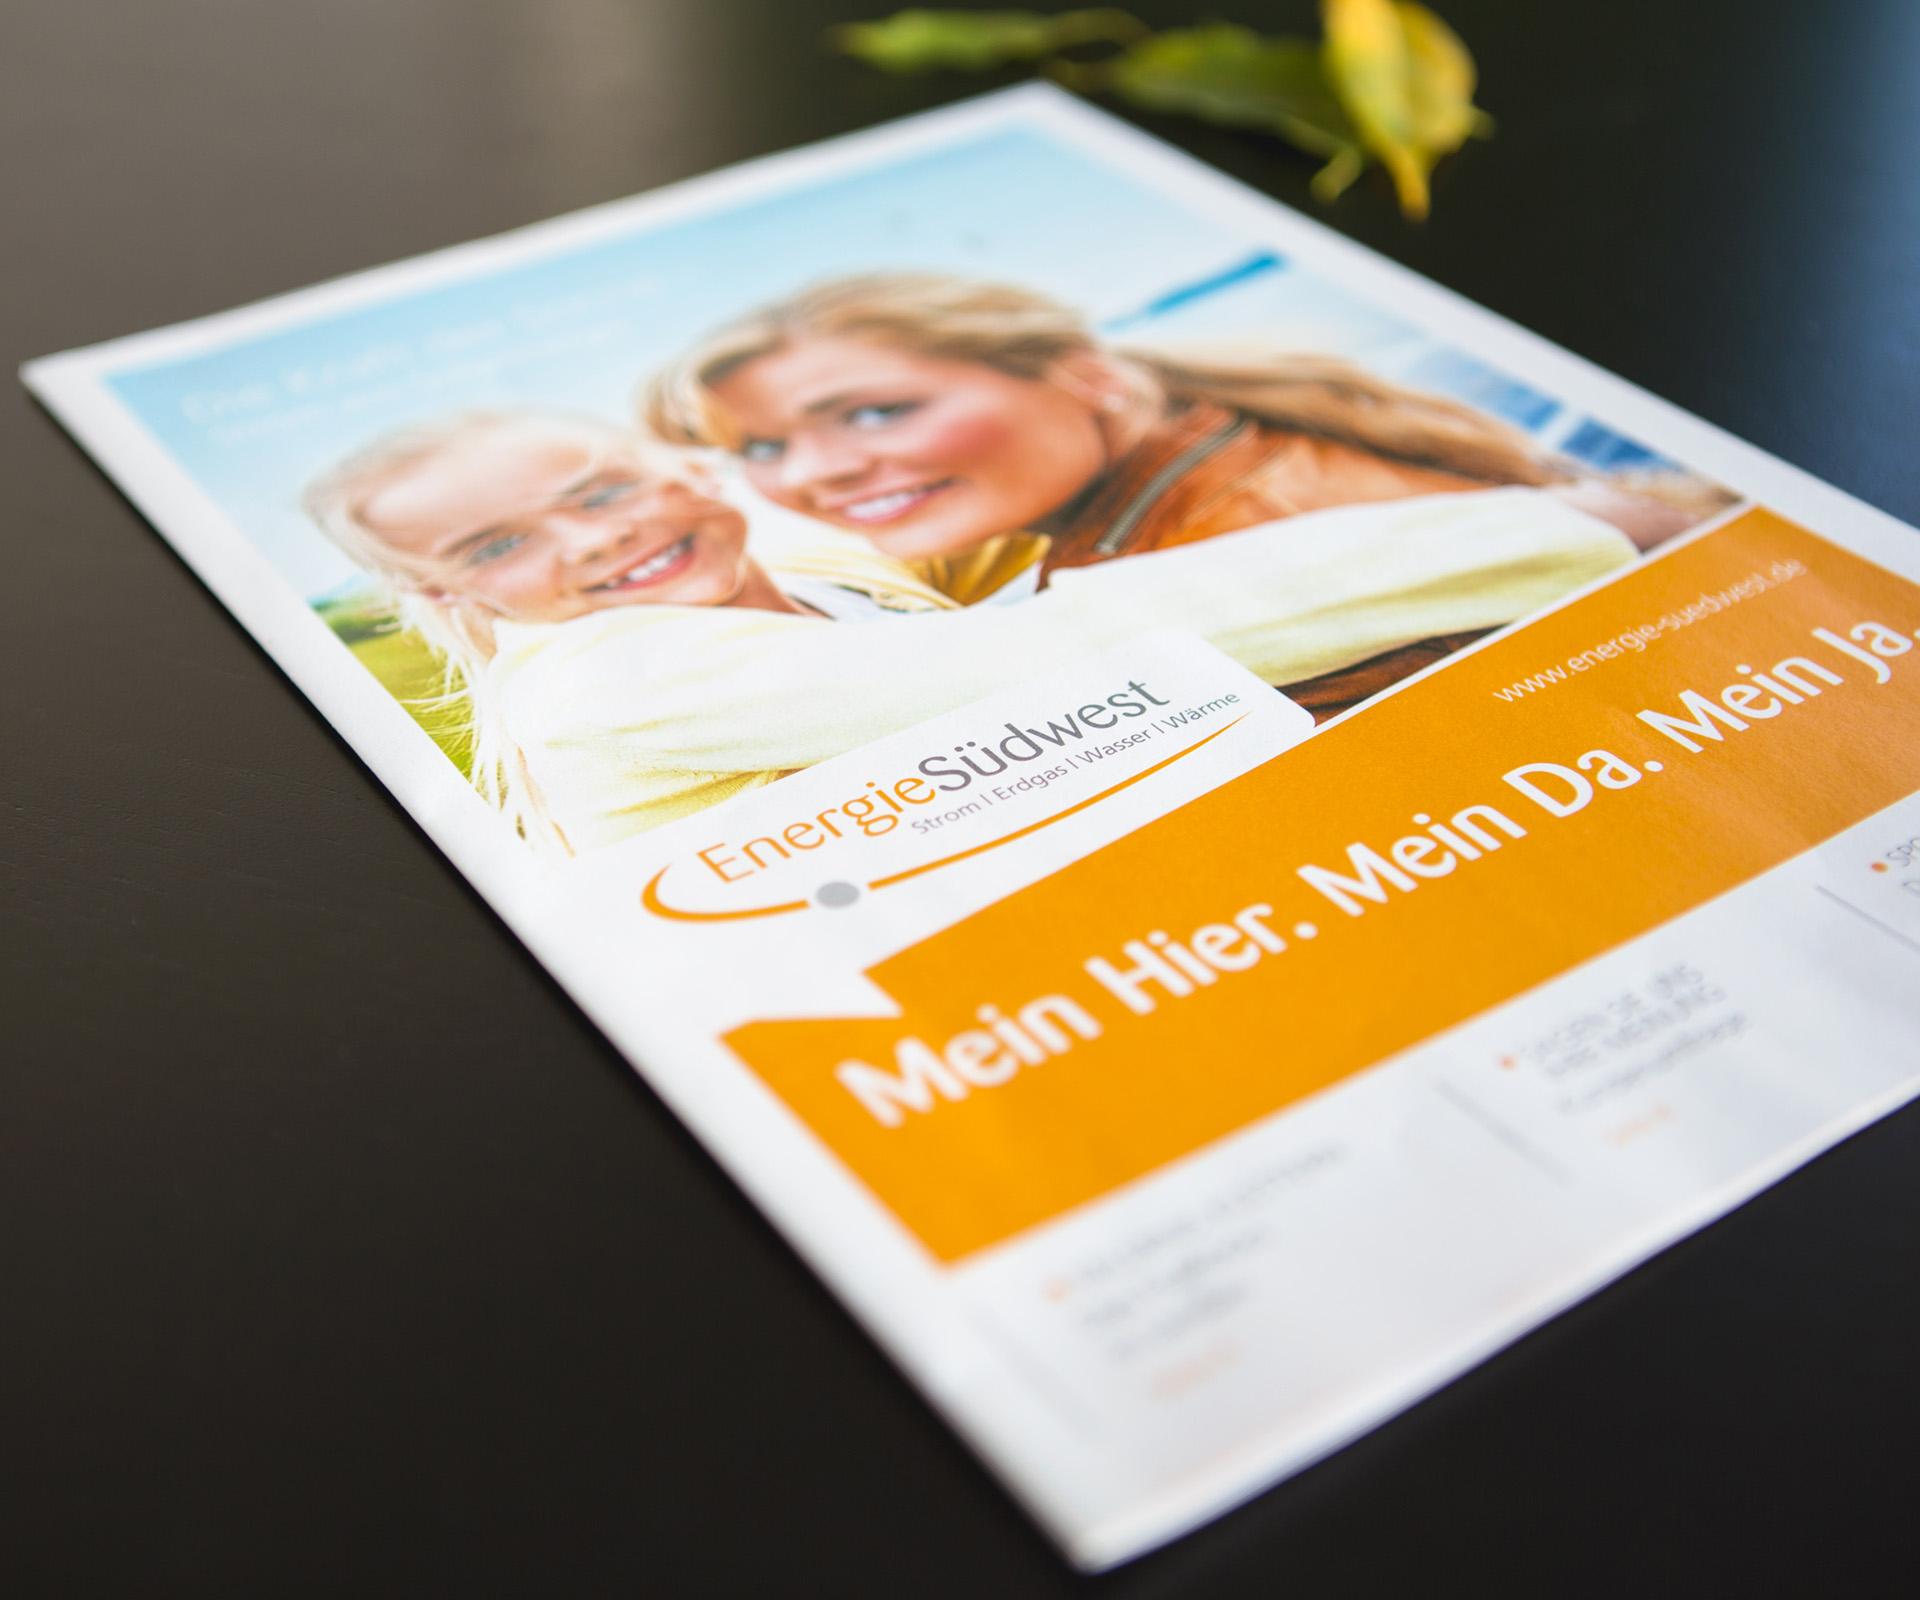 Sabath Media Werbeagentur - EnergieSüdwest - Referenzbild 1